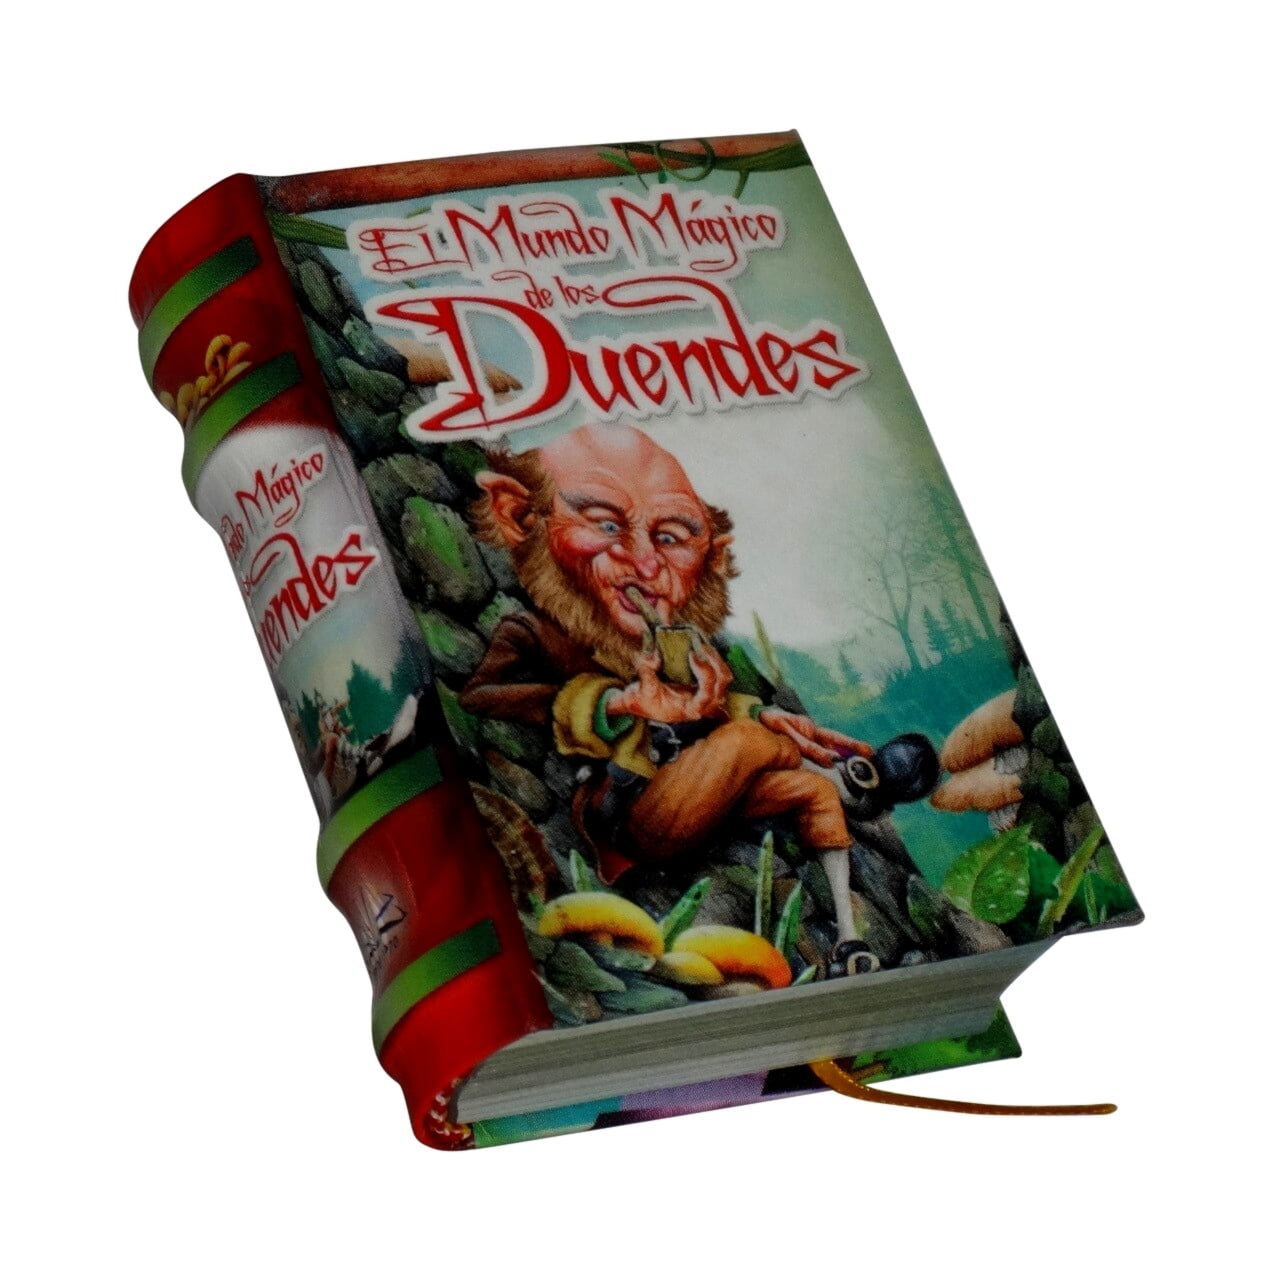 Duendes1-miniature-book-libro